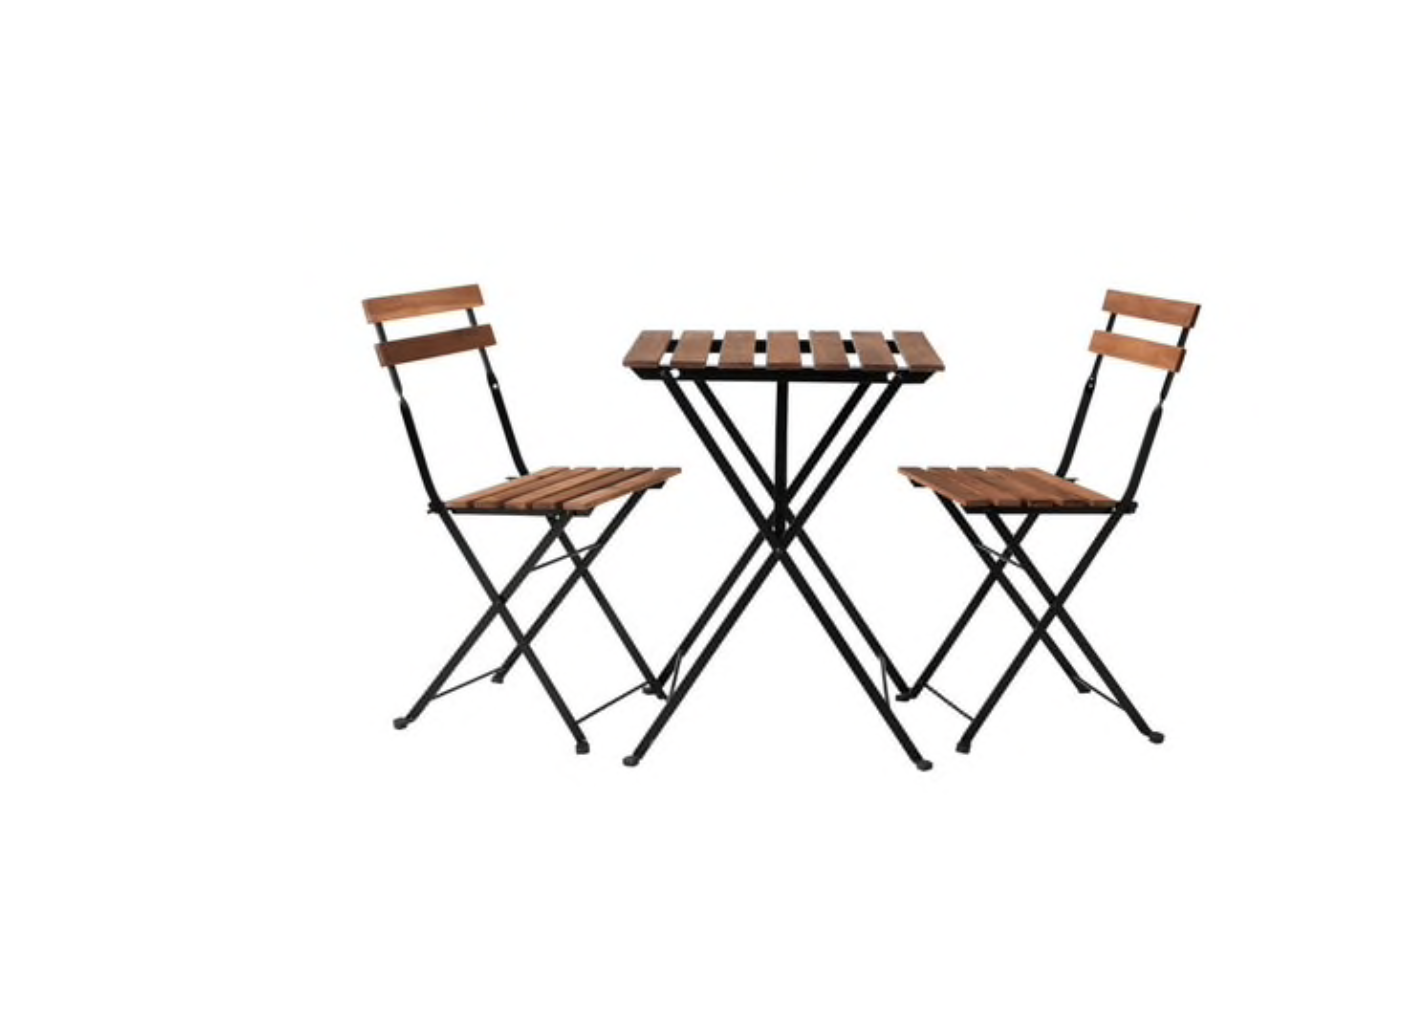 Garden Furniture - IKEA TRANO 3 PIECE FOLDING METAL OUTDOOR GARDEN PATIO FURNITURE TABLE & CHAIRS